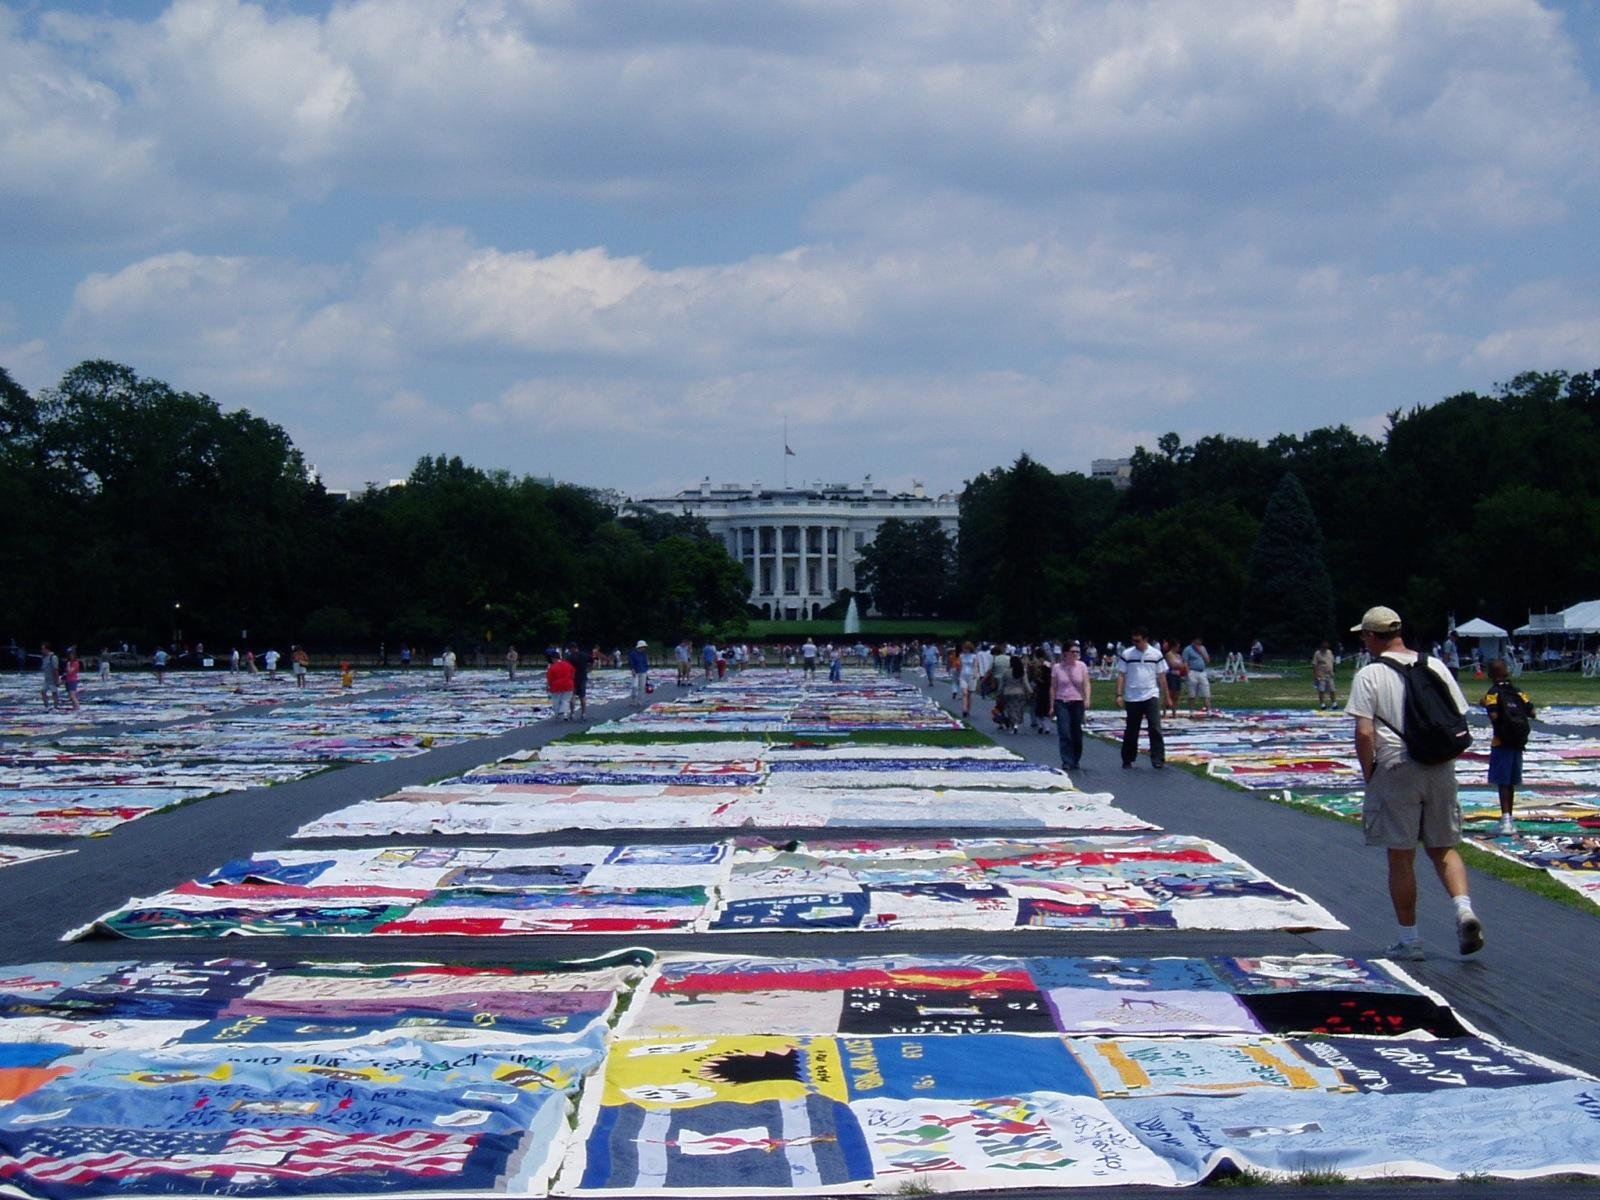 AIDS Quilt di fronte alla Casa Bianca. Credit: Scott Chacon / Flickr. Licenza: CC BY-SA 2.0.